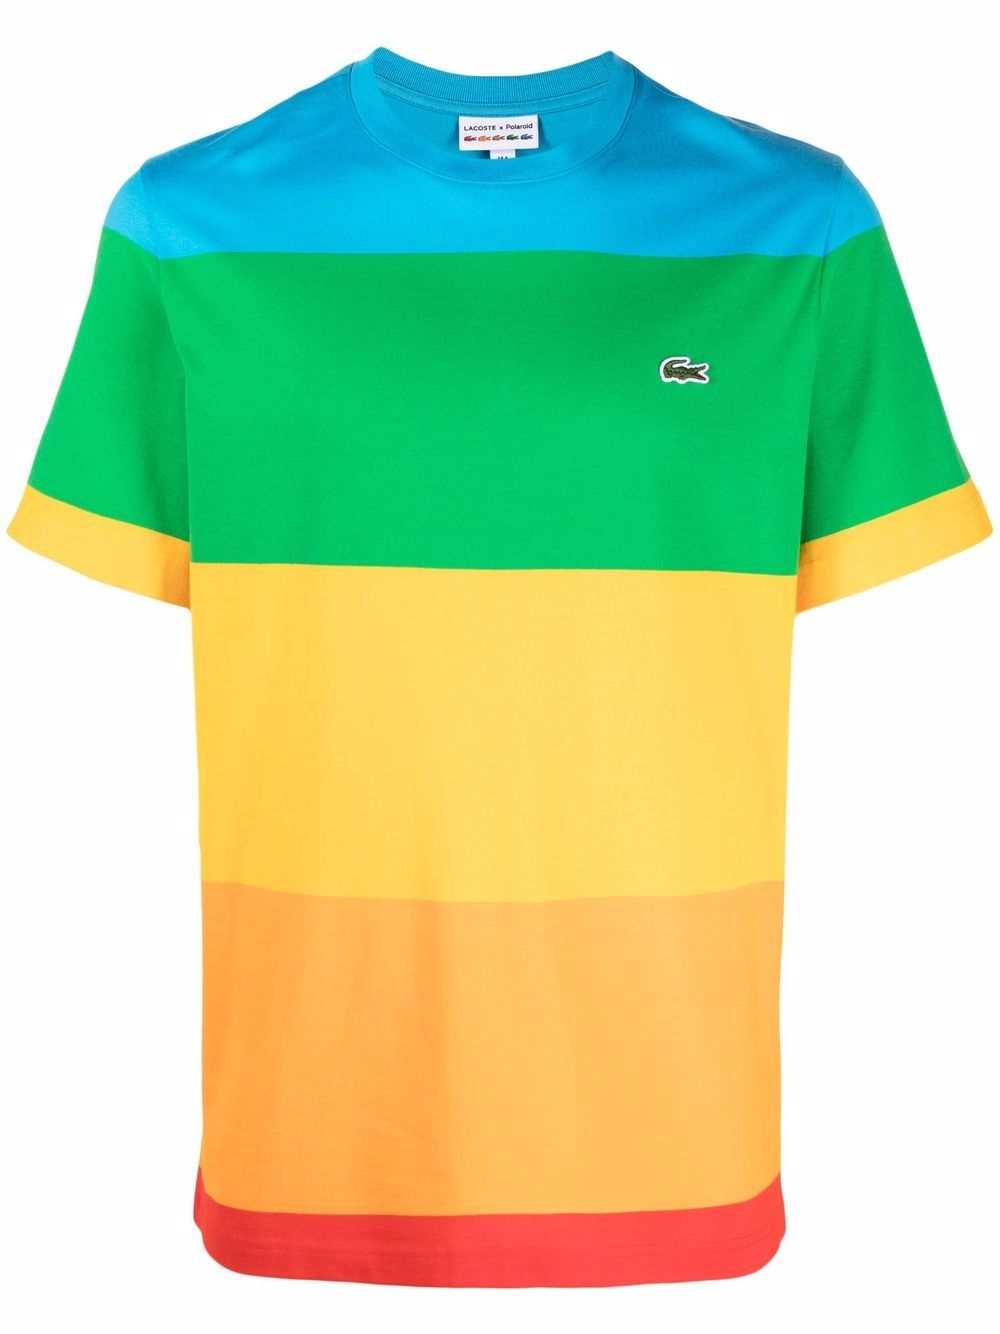 Lacoste logo t-shirt man multicolor LACOSTE | T-shirts | TH2098LLX